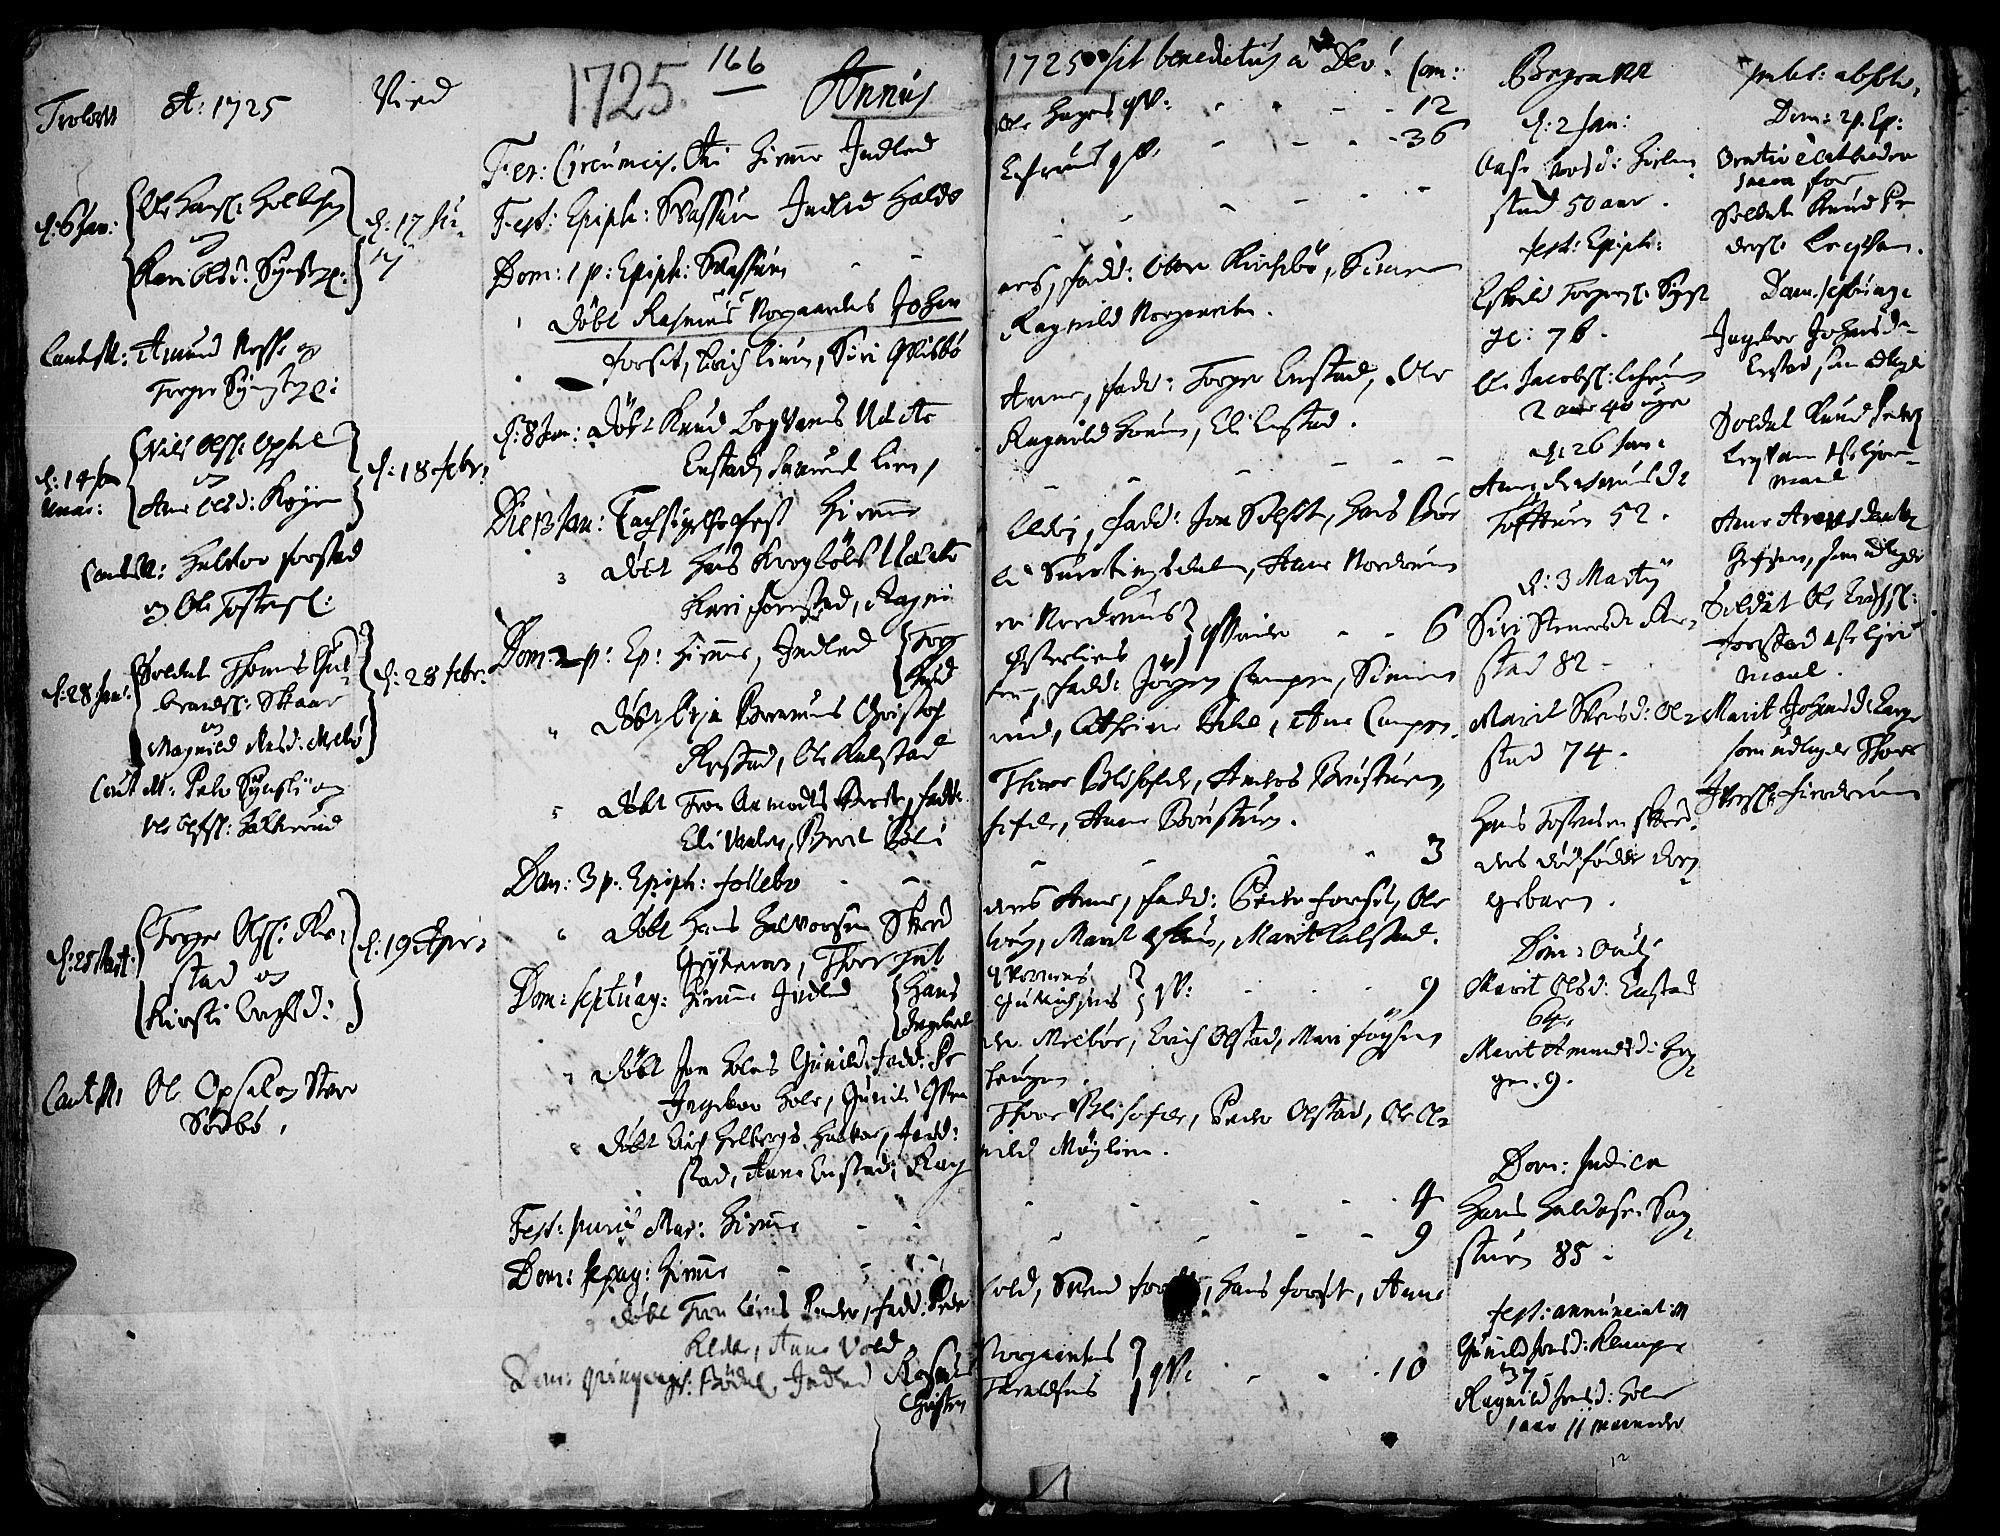 SAH, Gausdal prestekontor, Ministerialbok nr. 1, 1693-1728, s. 166